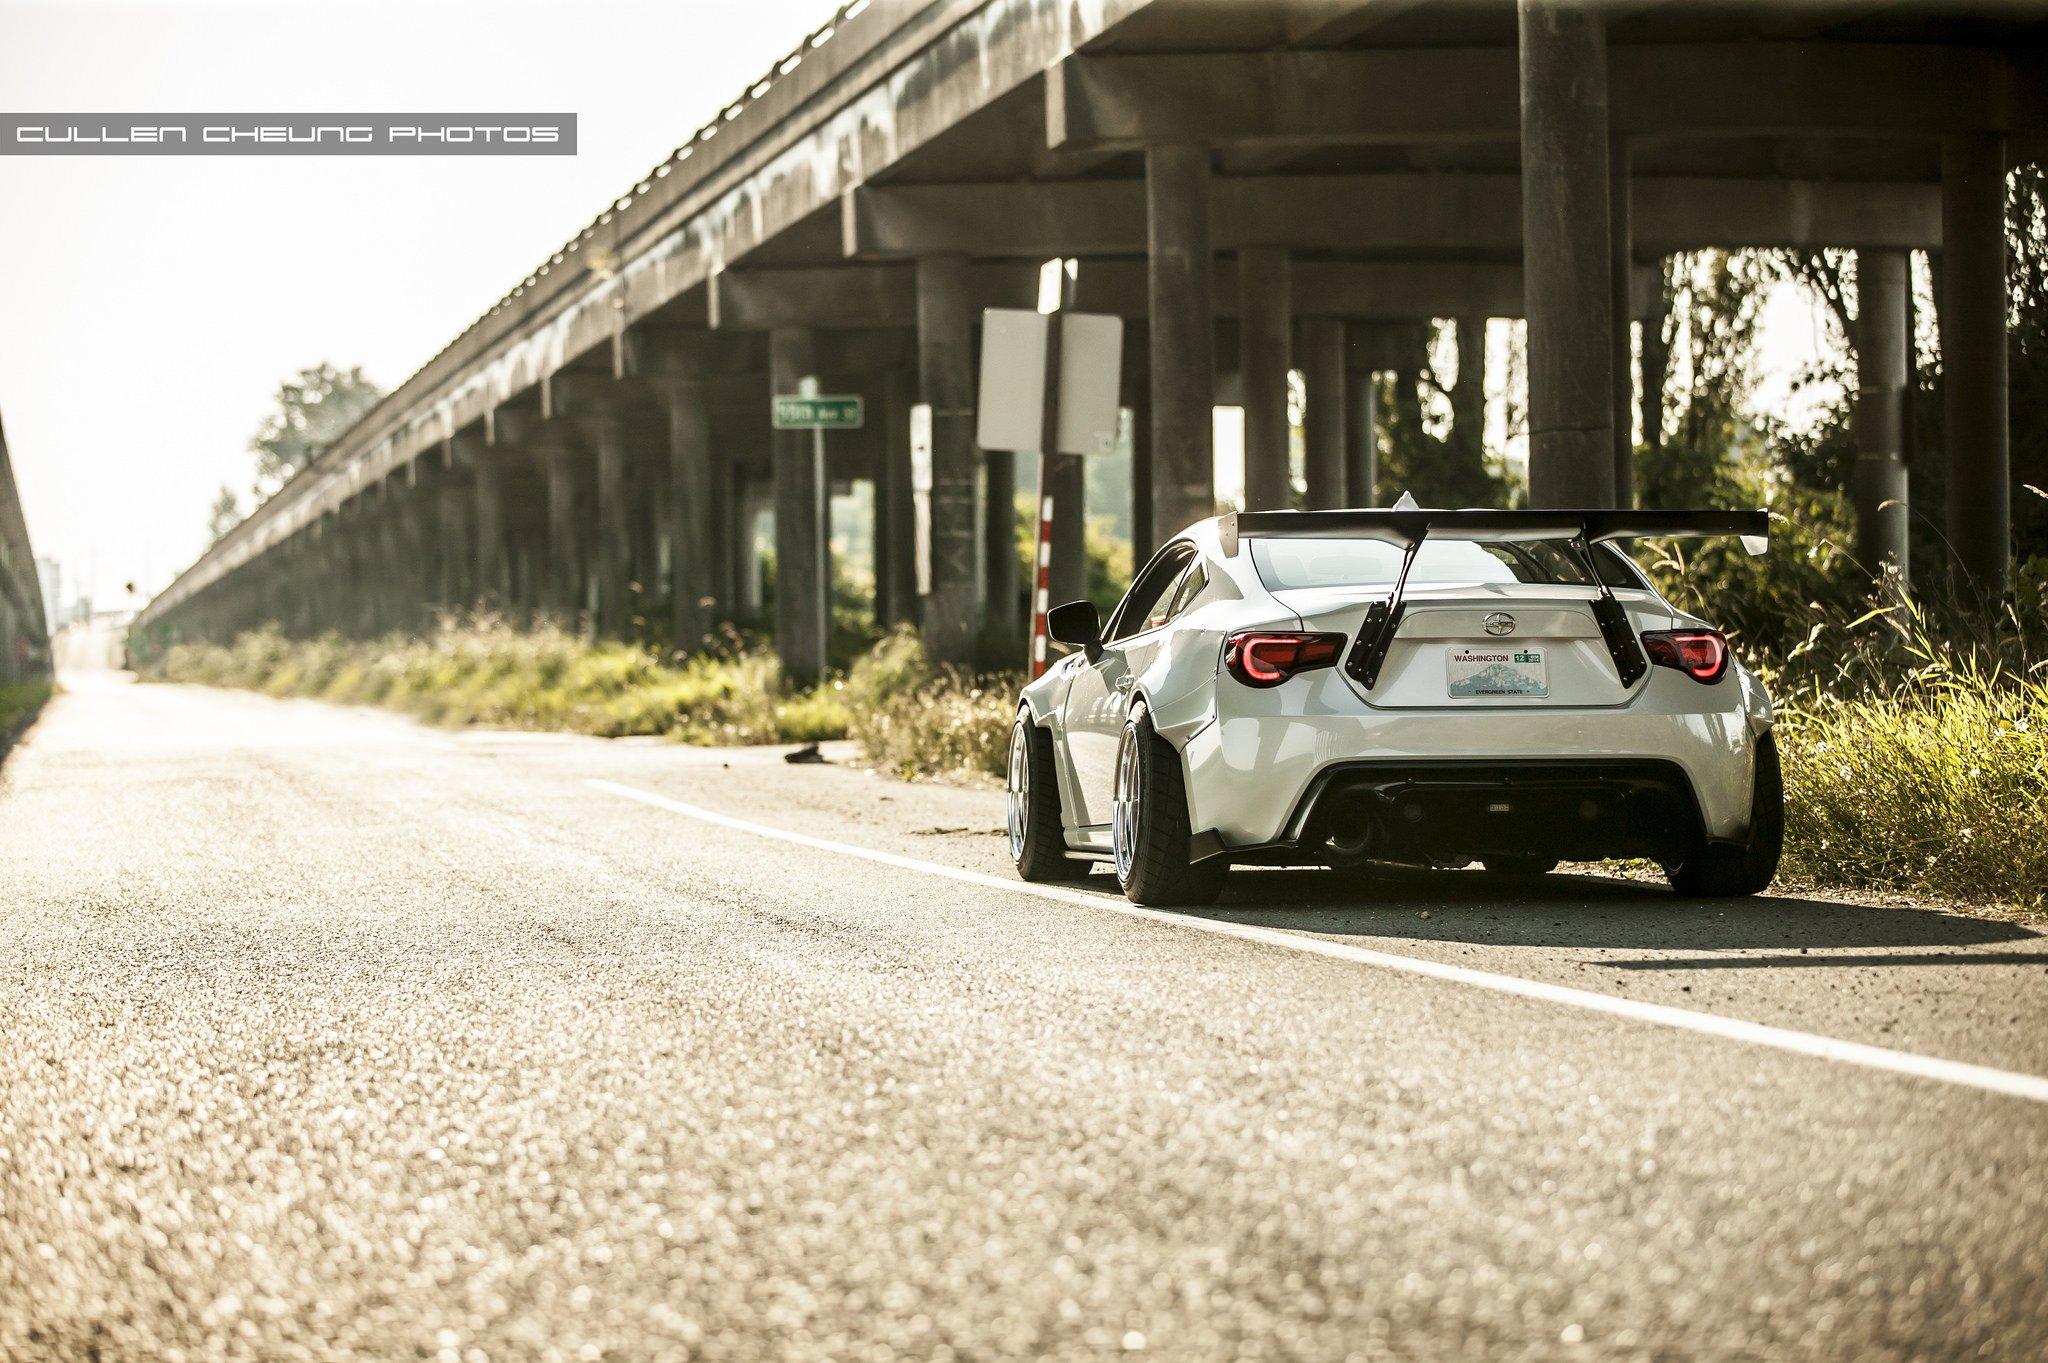 Mitsubishi Evo 9 Hd Wallpaper 2015 Bodykit Bunny Frs Rocket Scion Tuning Widebody